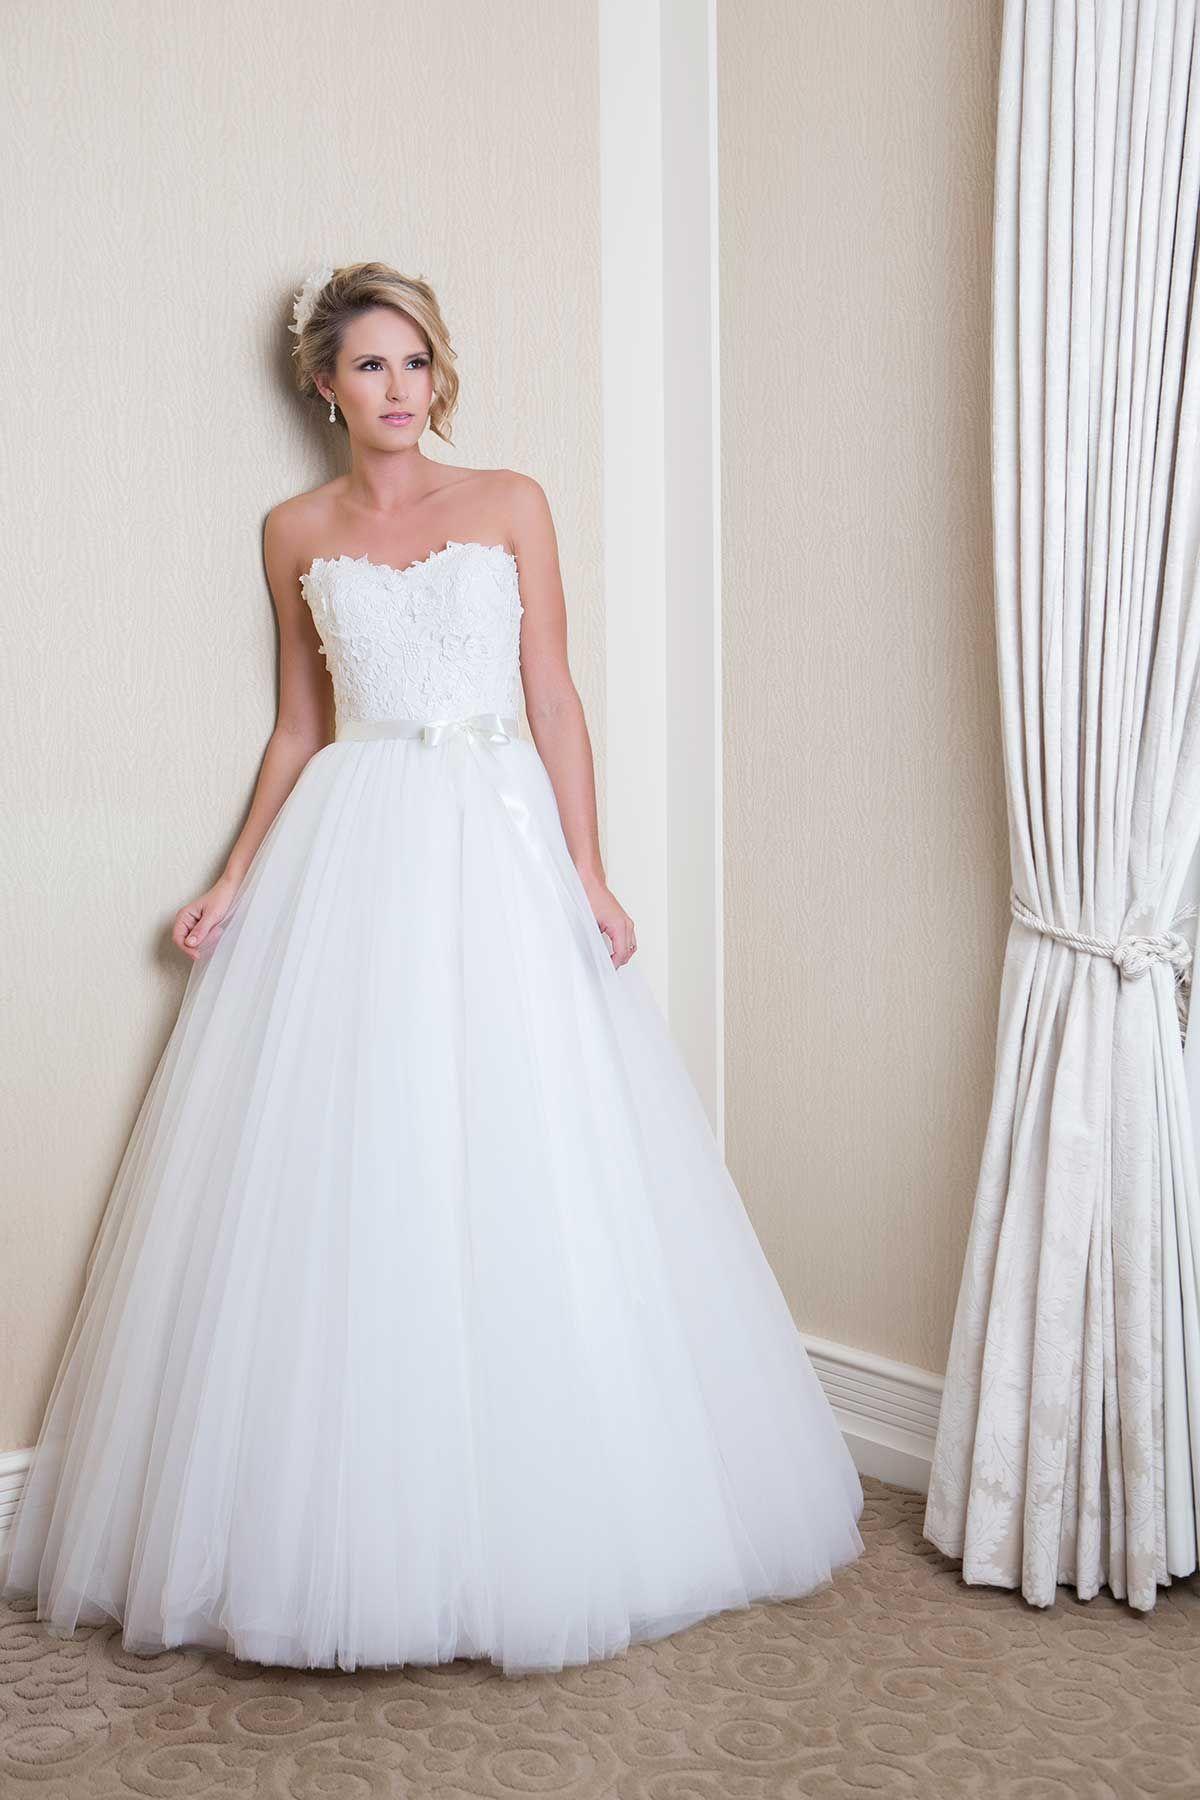 Danielle Australian wedding dress designers, Wedding